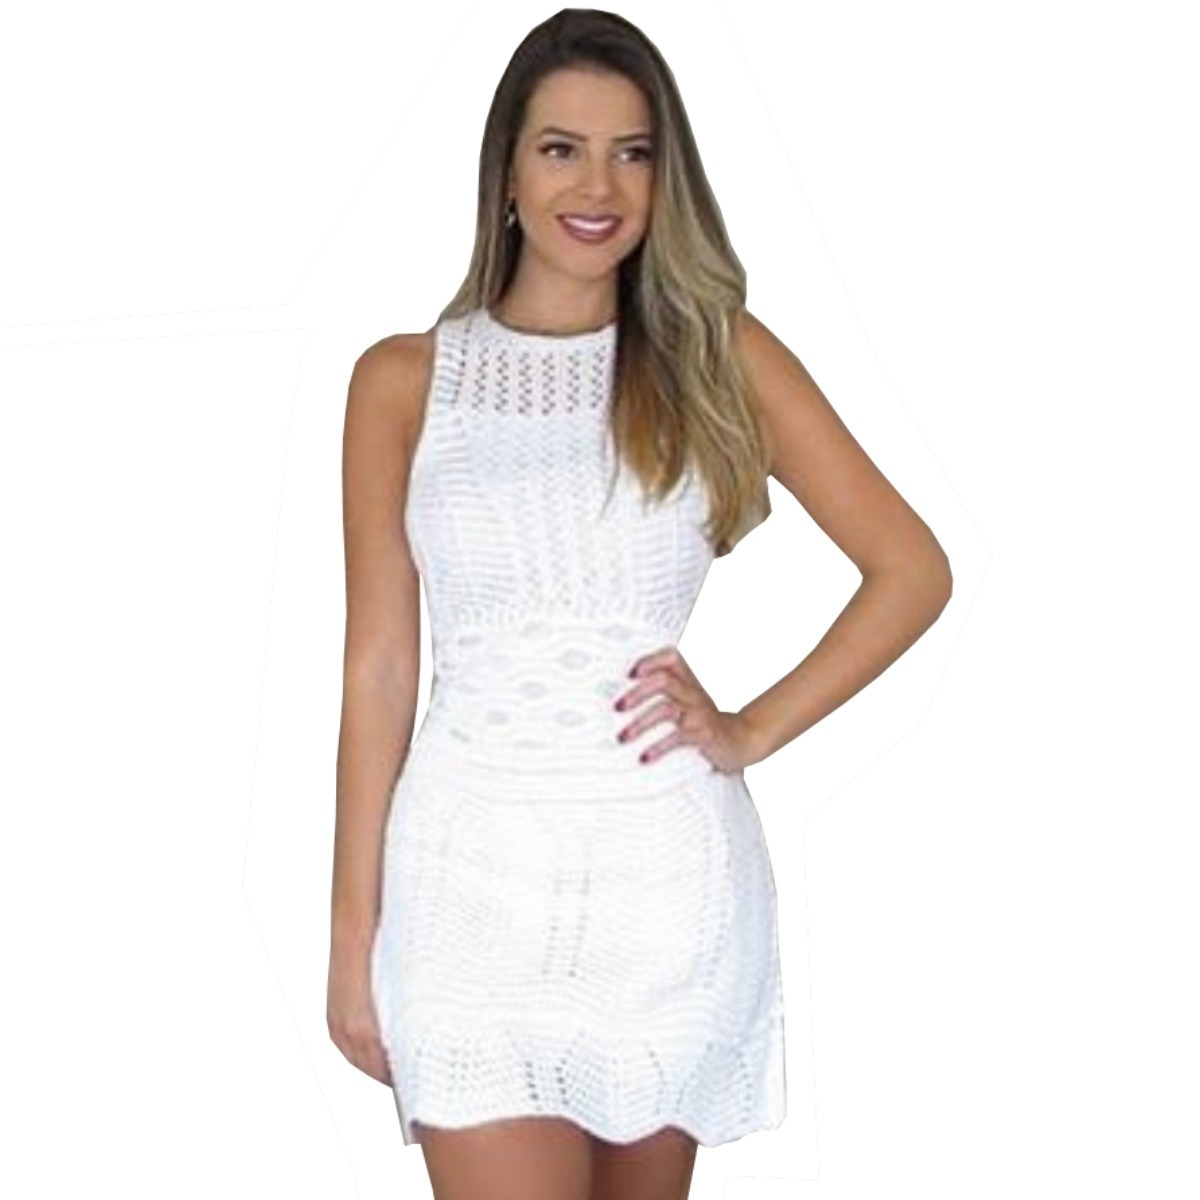 5dbd7609e vestido de formatura curto de malha moda evangelica gestante. Carregando  zoom.